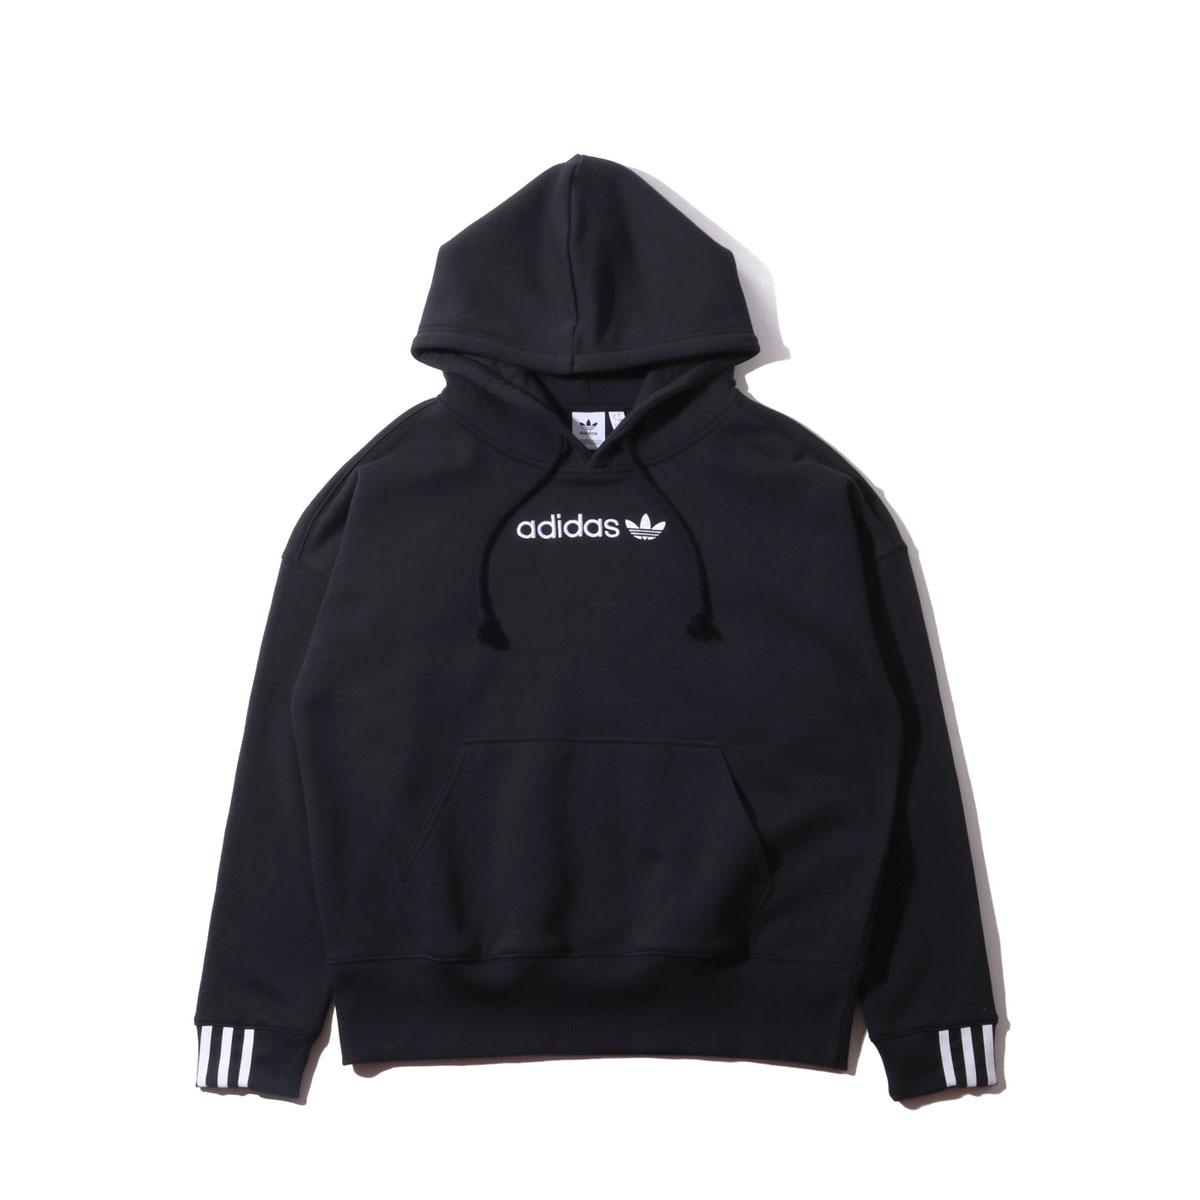 adidas Originals COEEZE HOODIE (アディダスオリジナルス COEEZE フーディー) BLACK【レディース パーカー】19SS-S